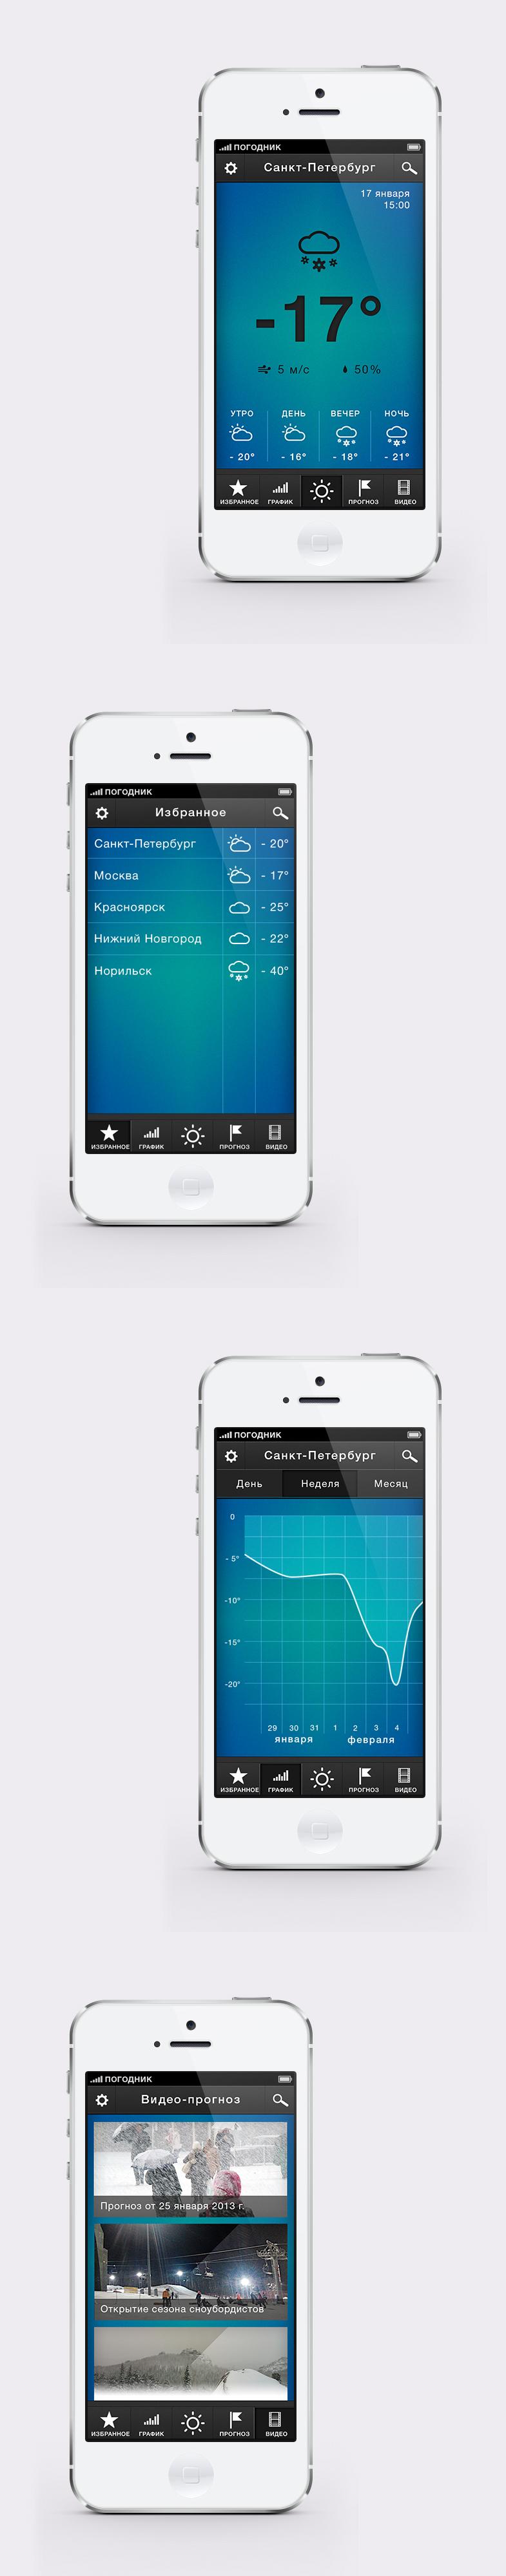 Прогноз погоды (iphone)